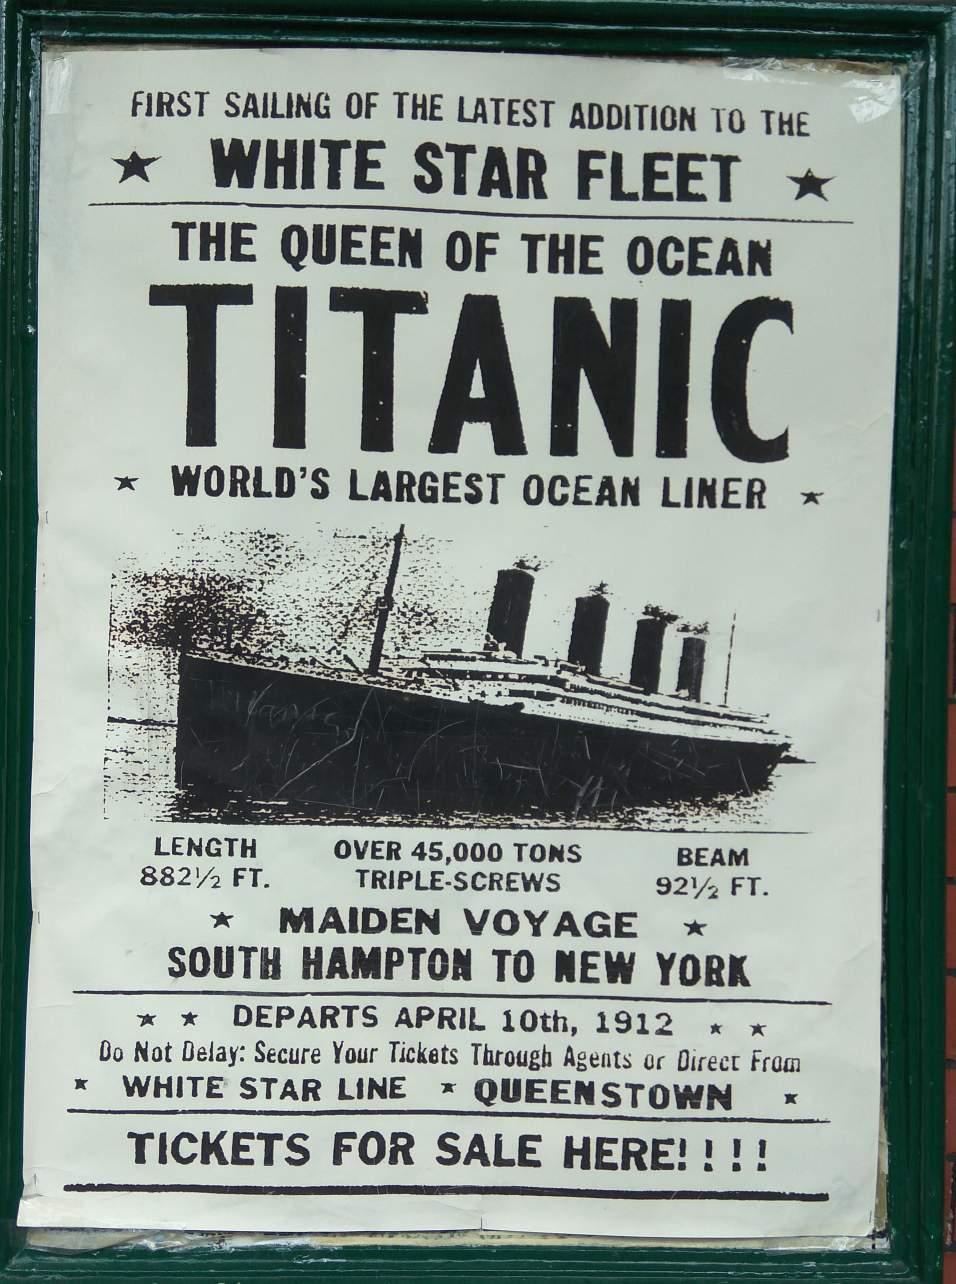 Titanic Engine Room Underwater: Romancing The Titanic: A Visit To The Gigantic Museum In